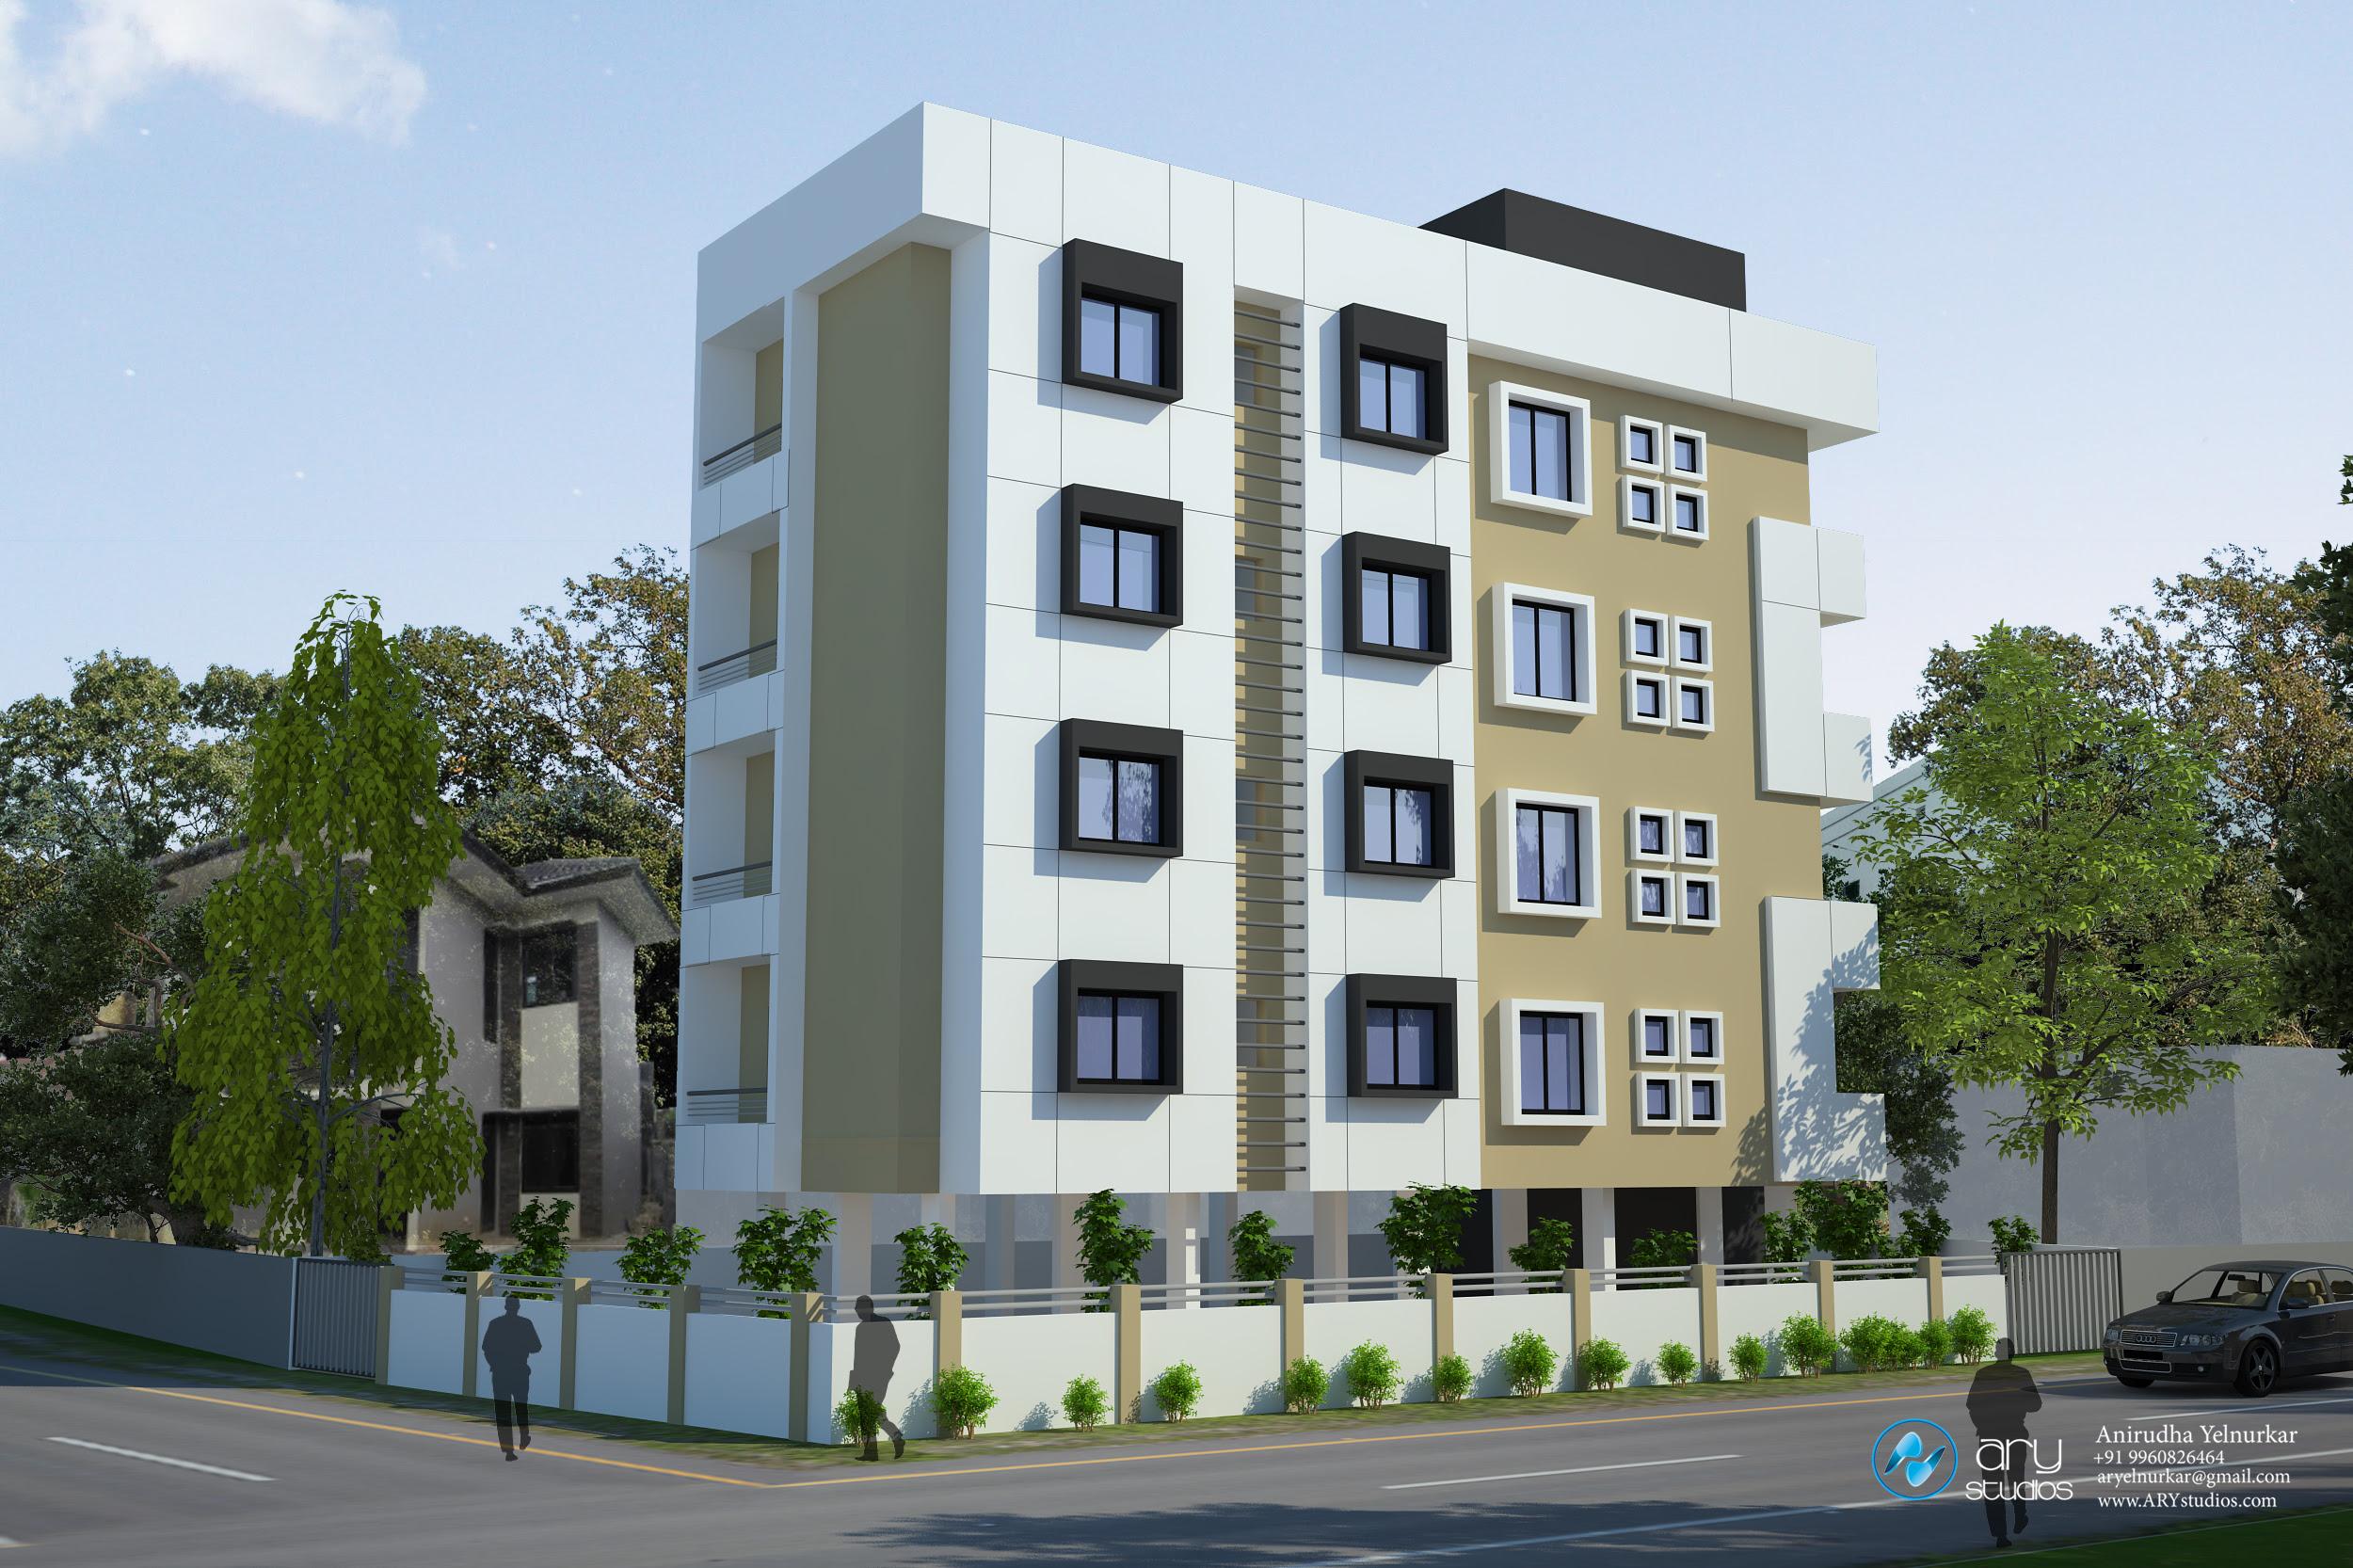 3D_Apartment_Building_Elevation_Aurangabad_India_ARY_Studios_balcony